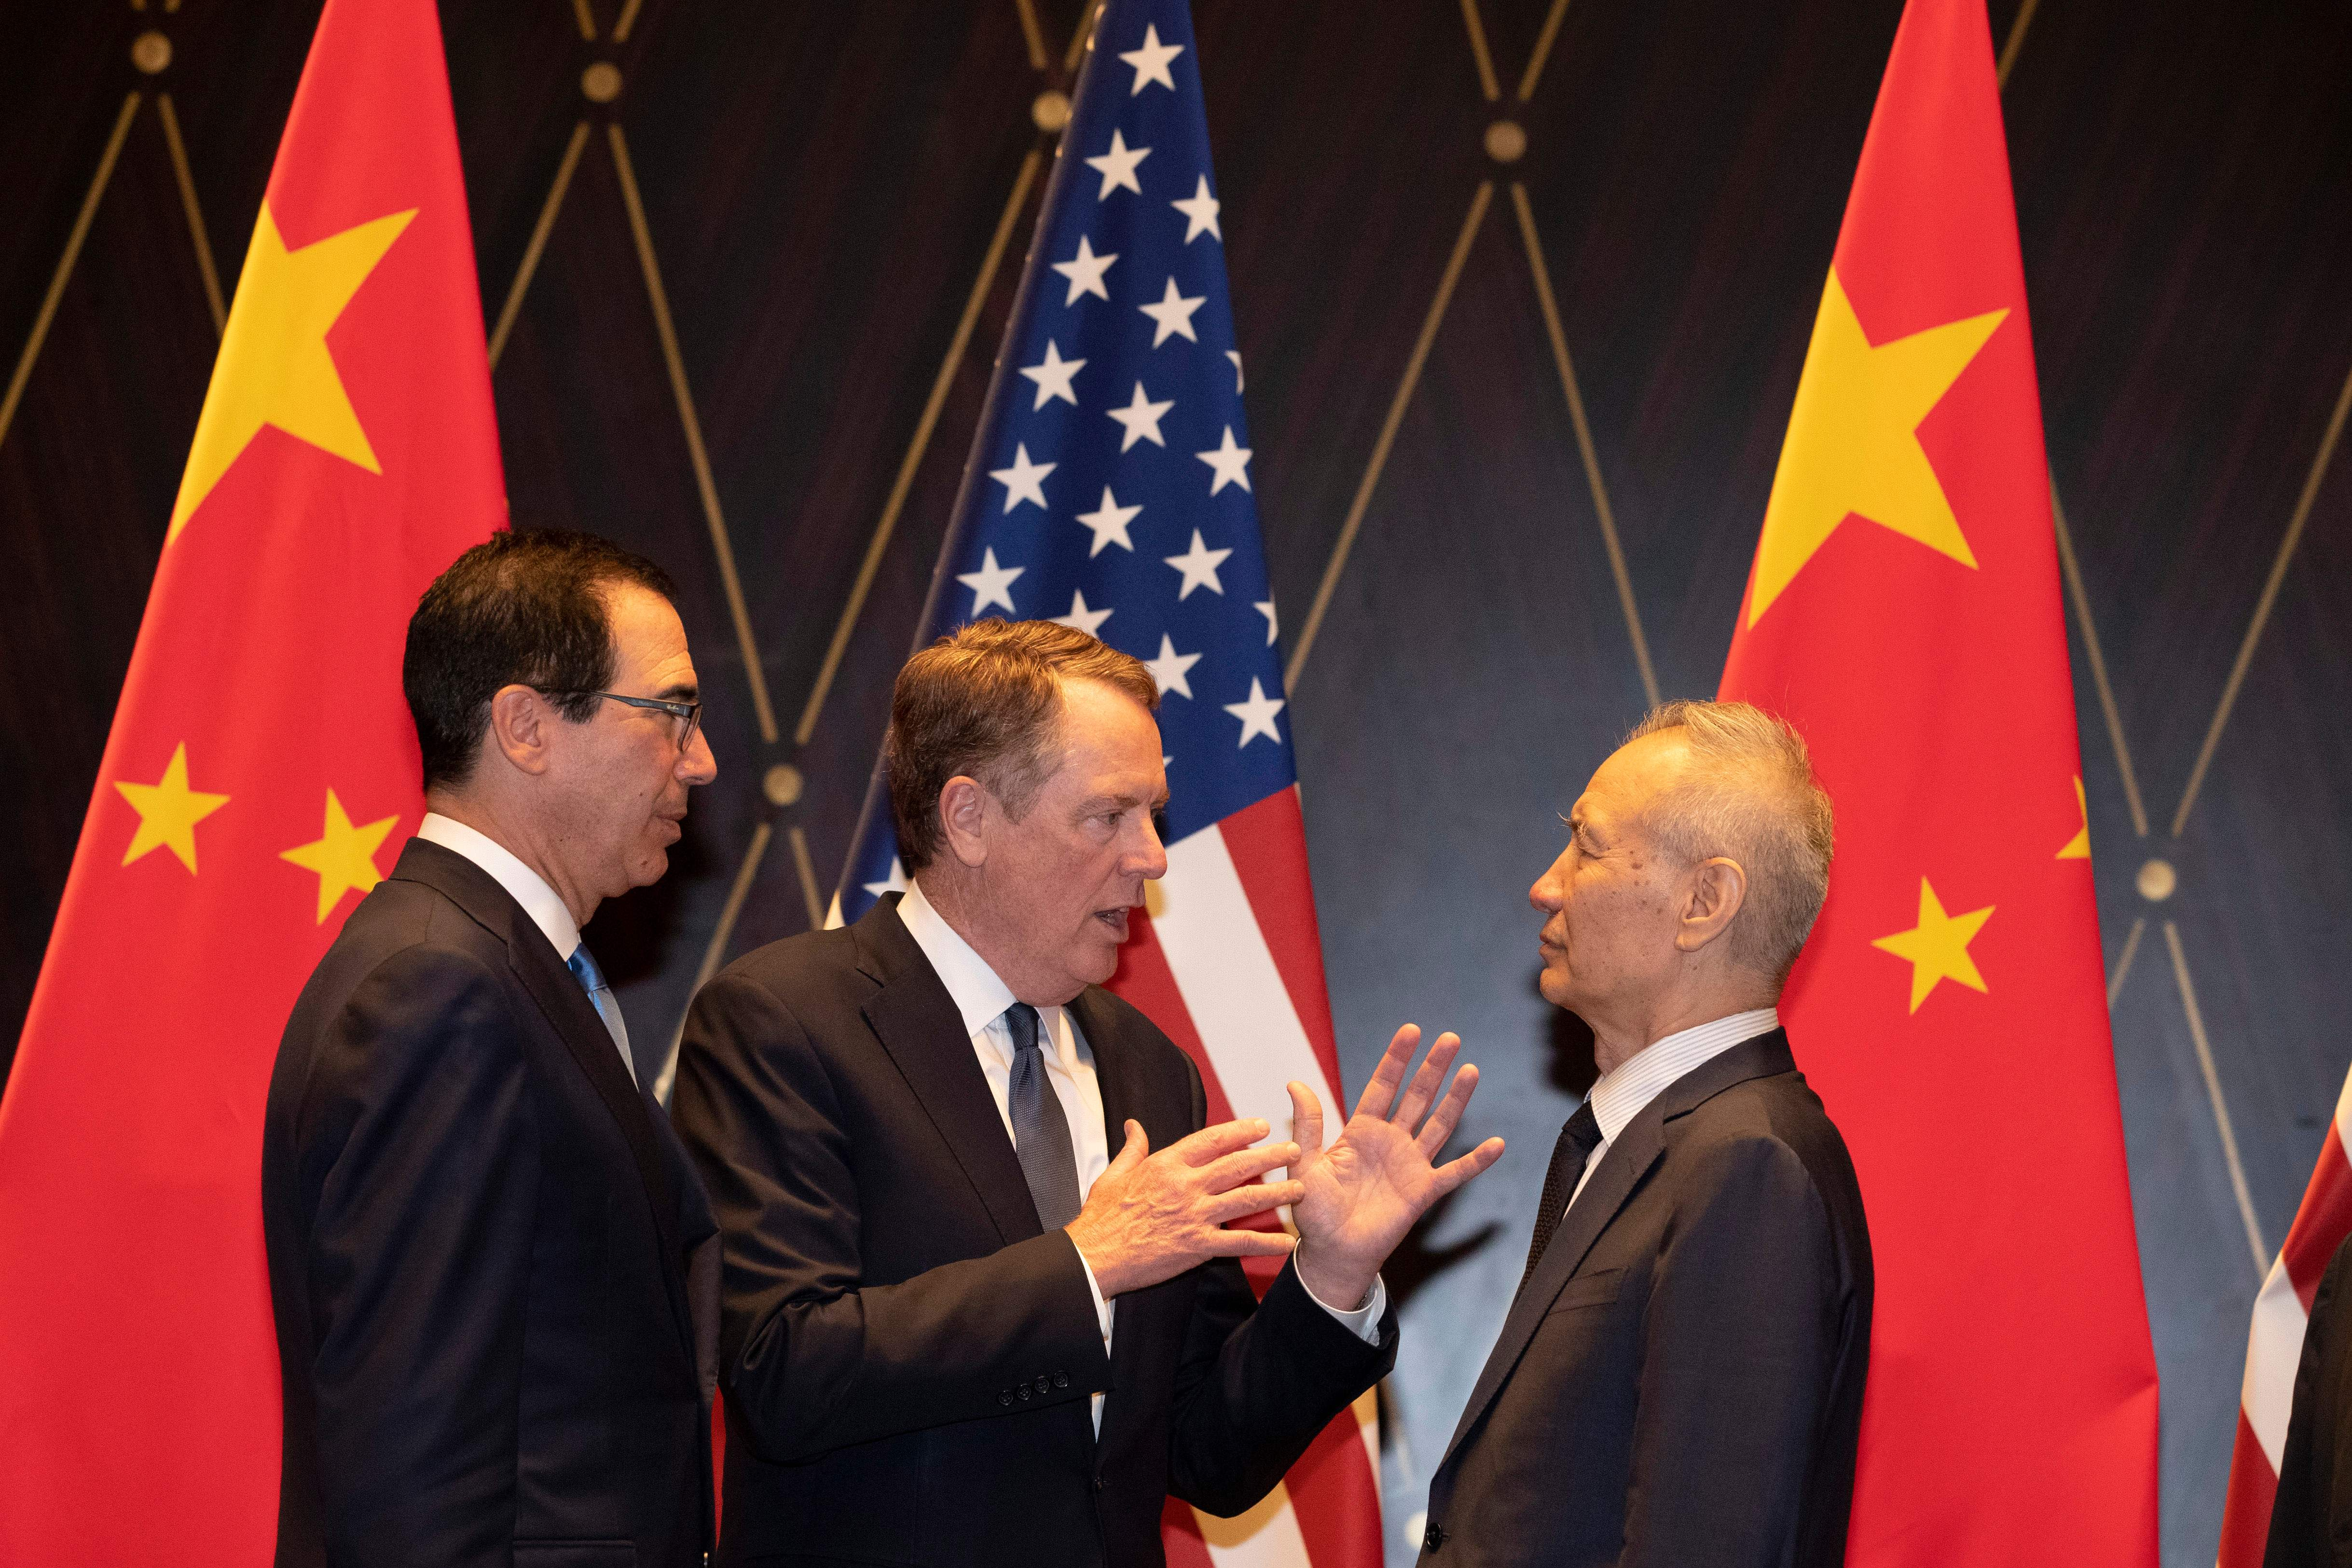 China trade talks are set to resume on Oct. 10